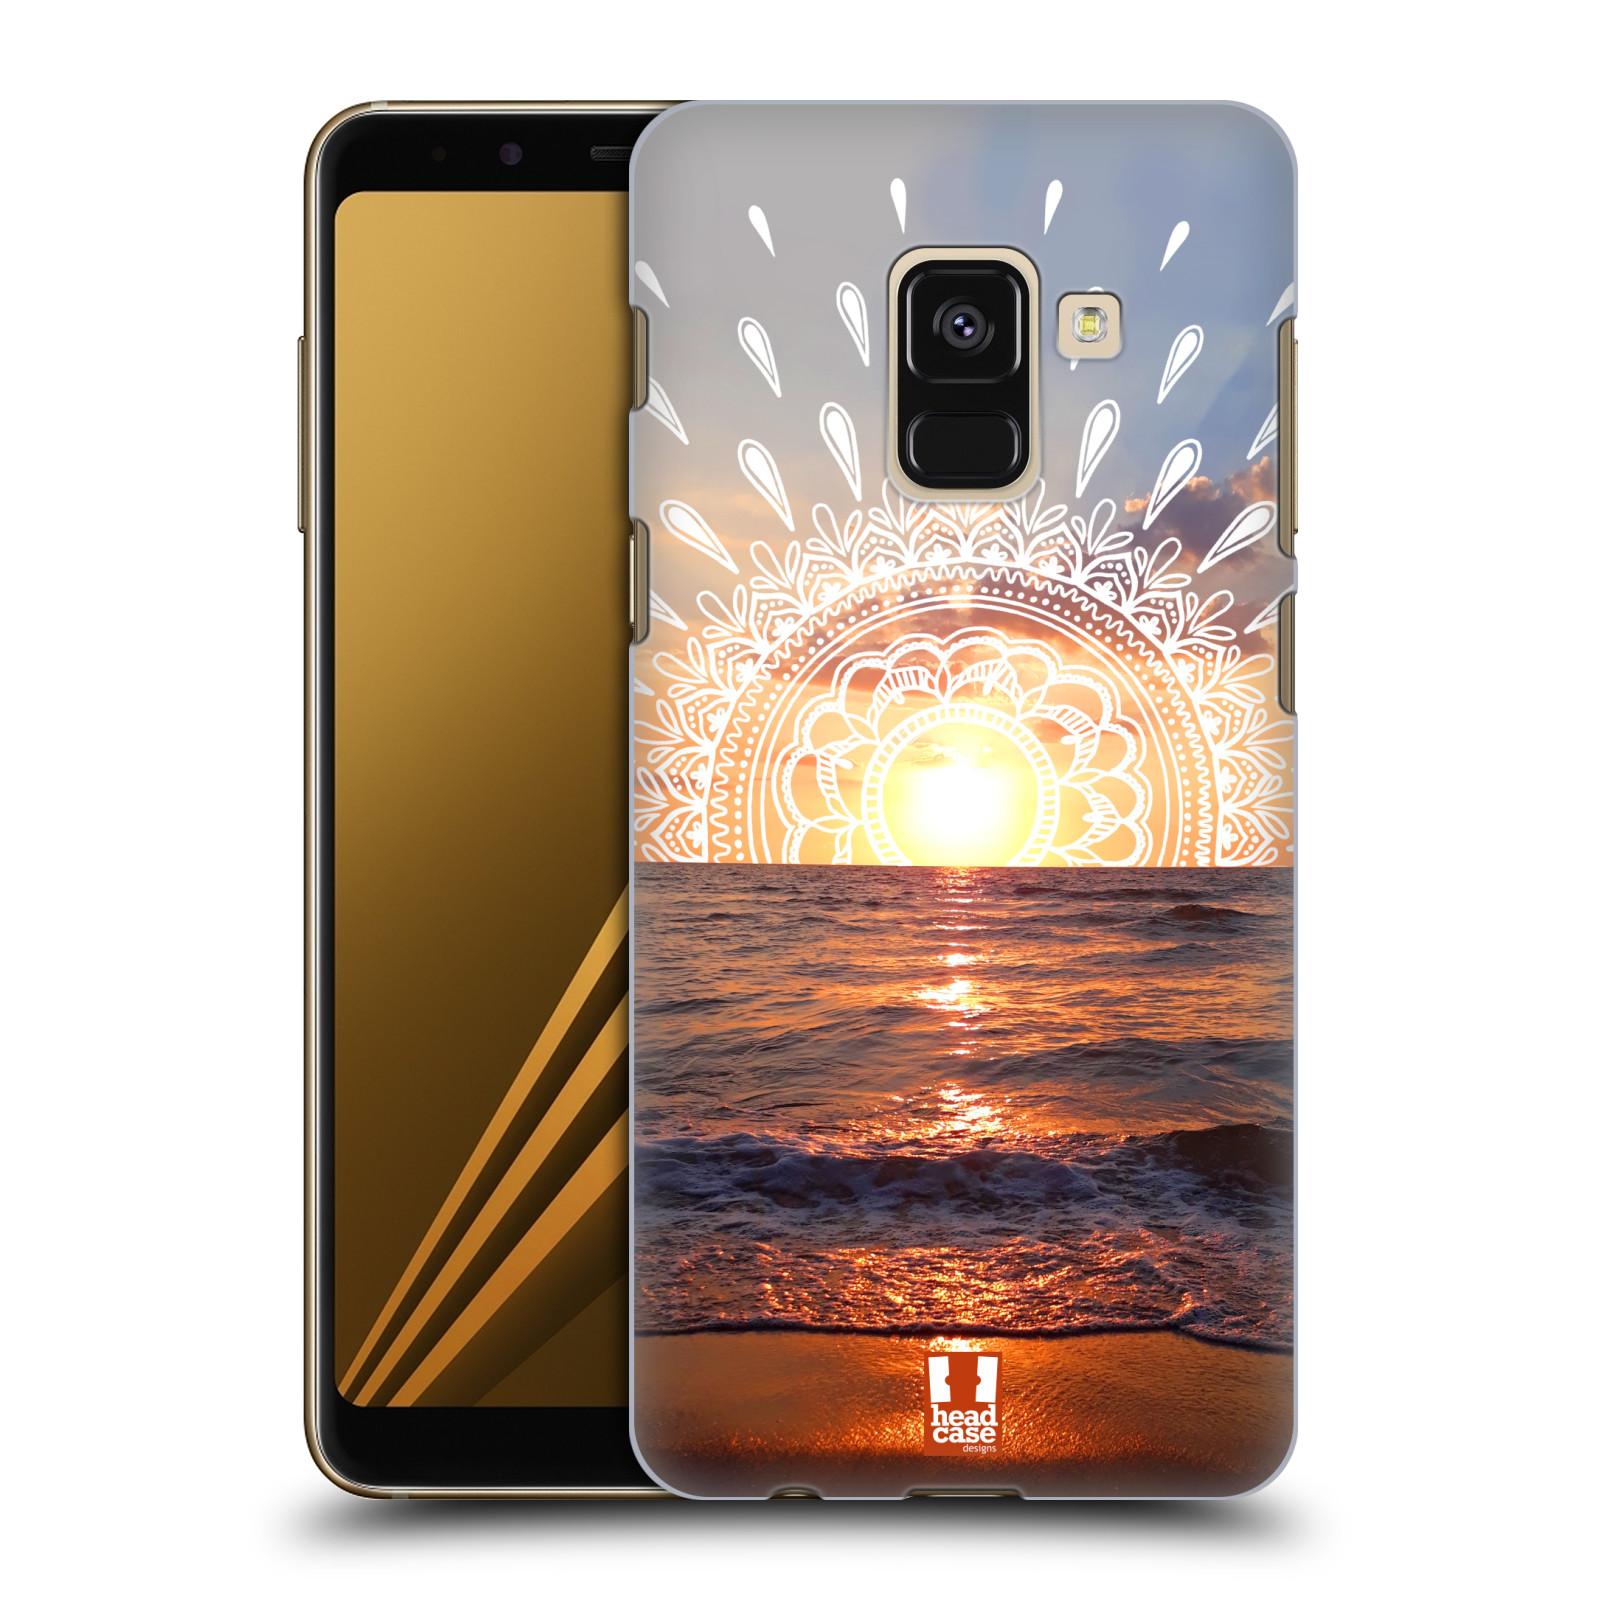 Pouzdro na mobil Samsung Galaxy A8+ 2018, A8 PLUS 2018 - HEAD CASE - doodle západ slunce